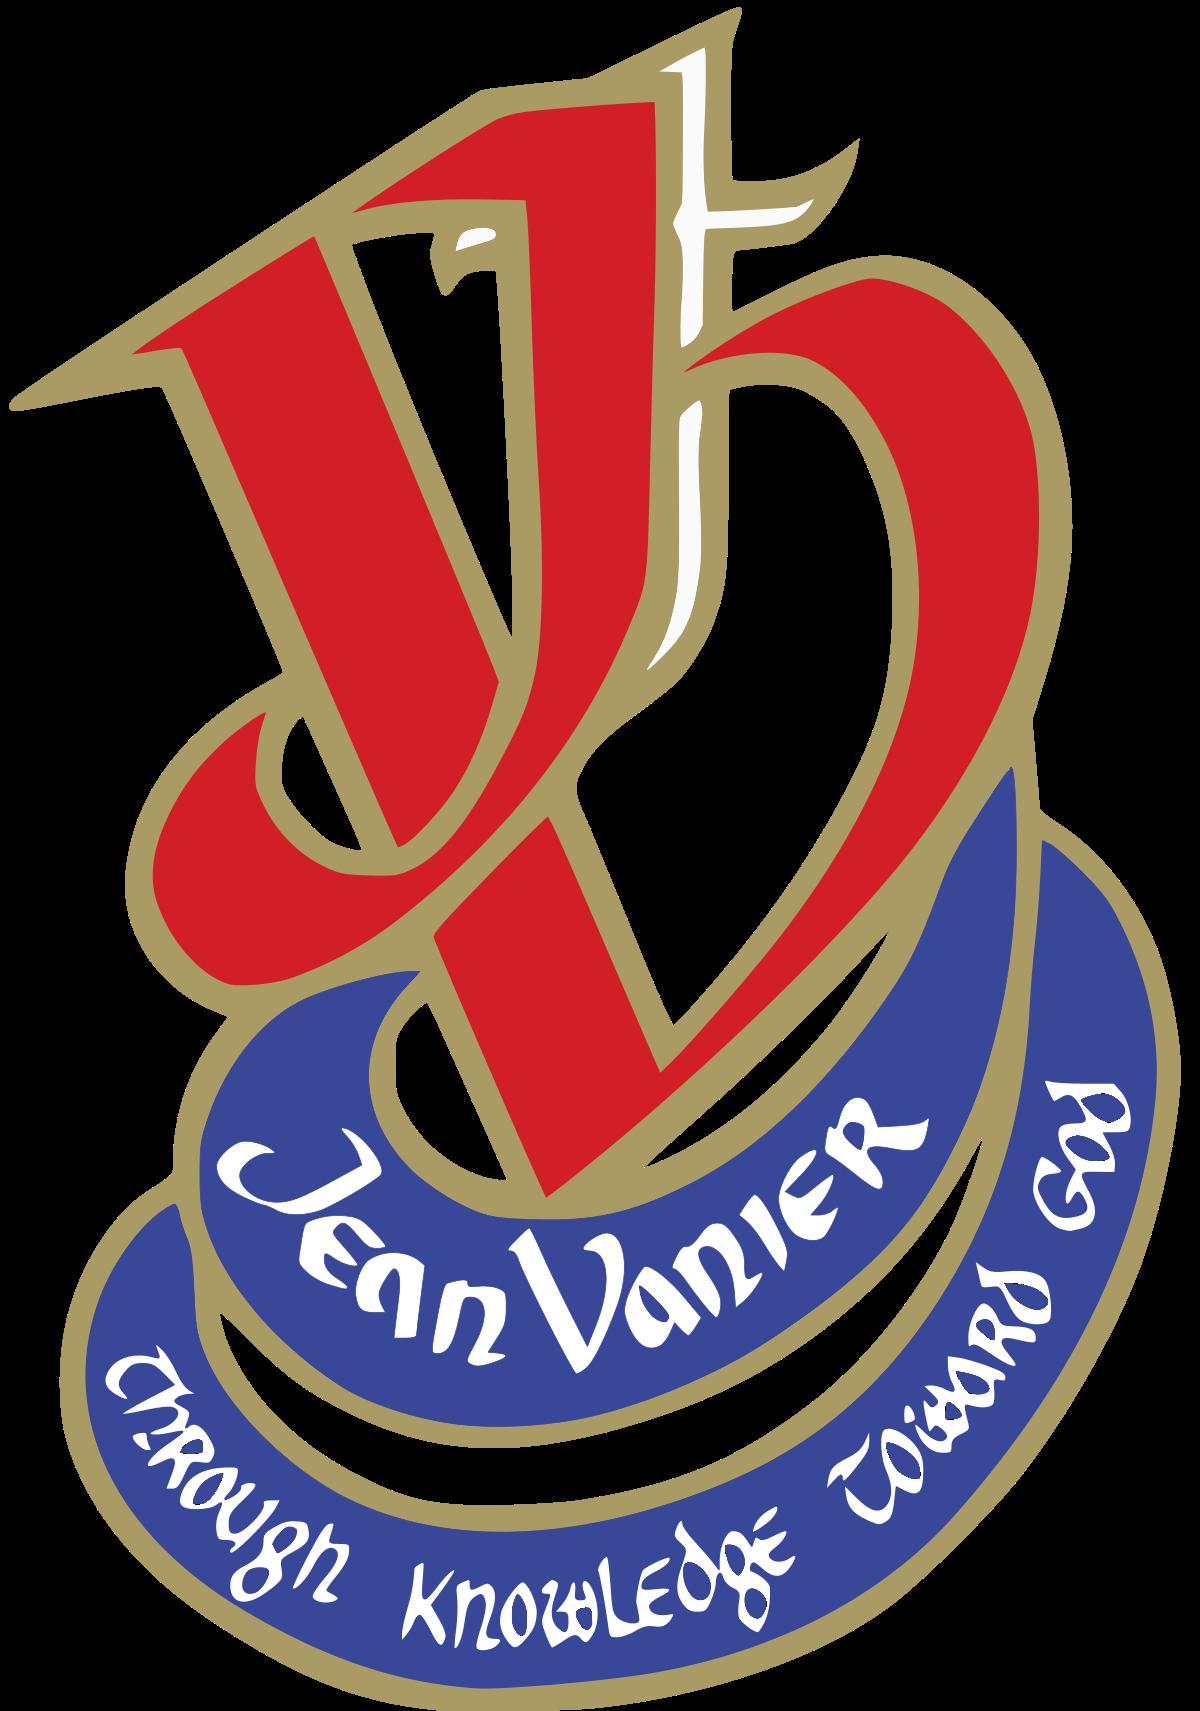 Jean Vanier Catholic Secondary School.